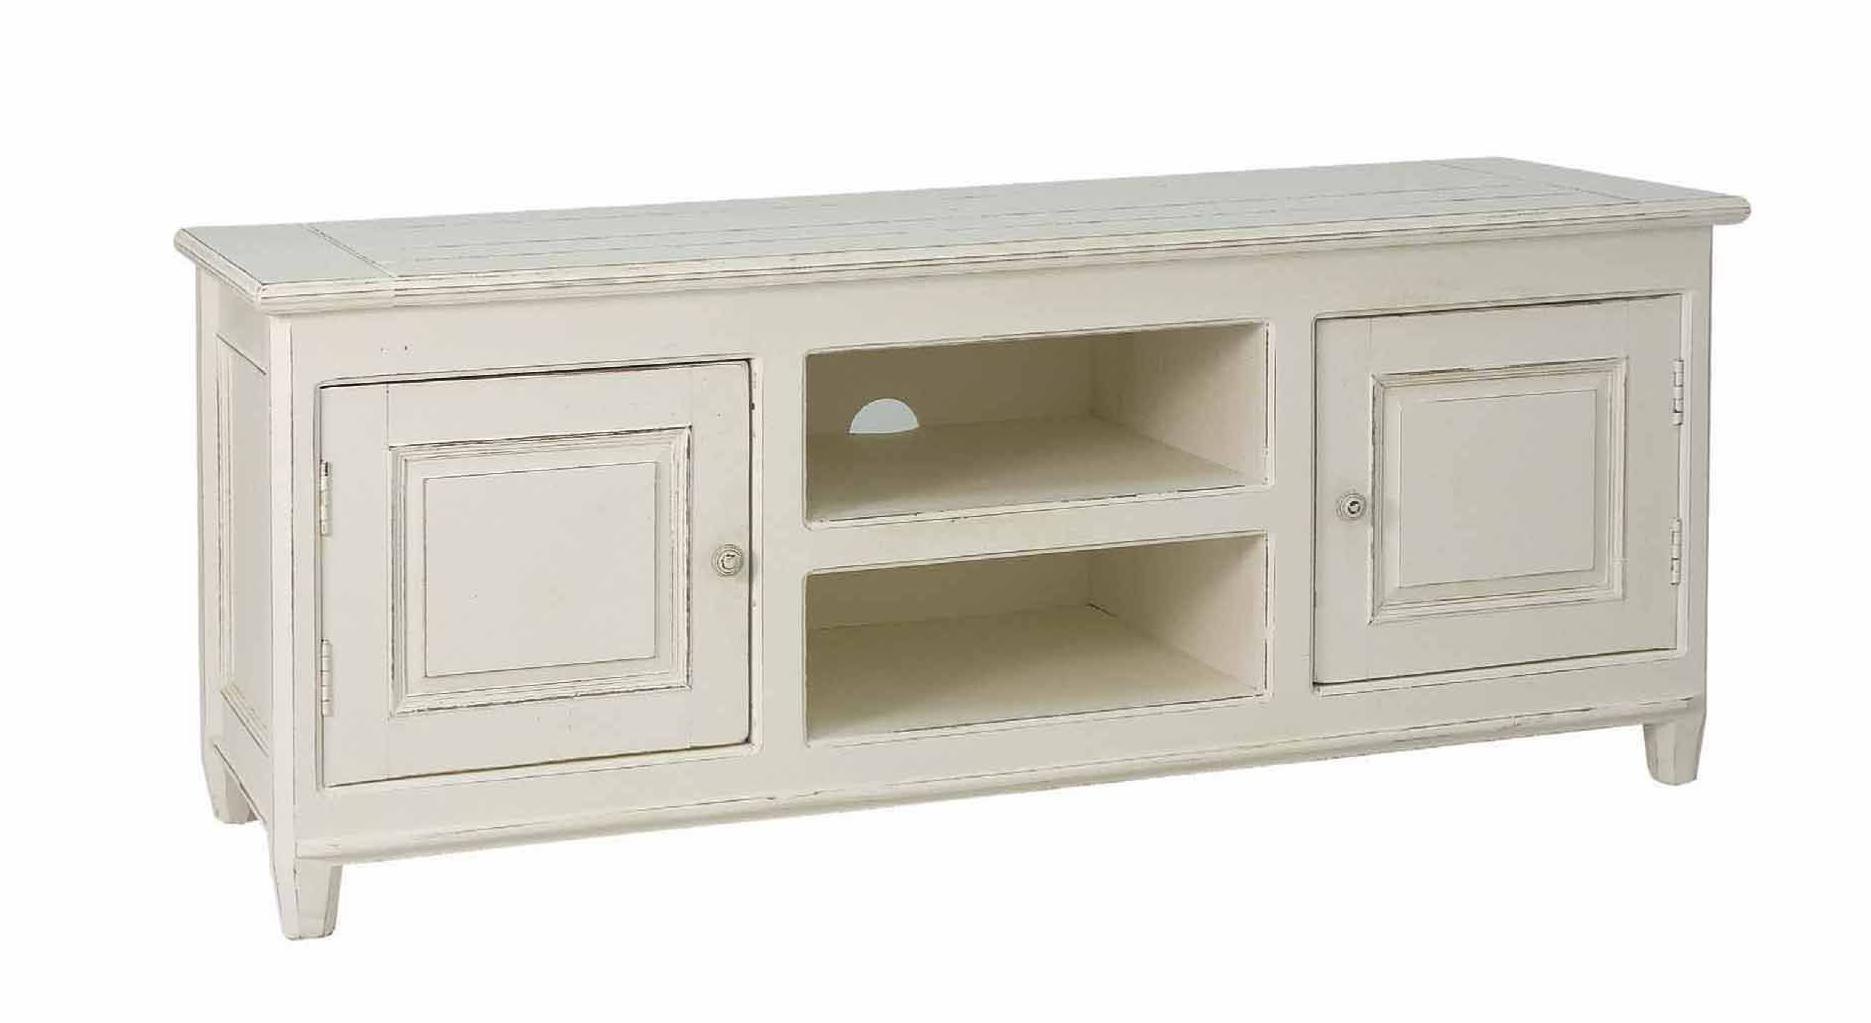 Pintar mueble gris envejecido 20170804091059 for Color de pared para muebles blancos